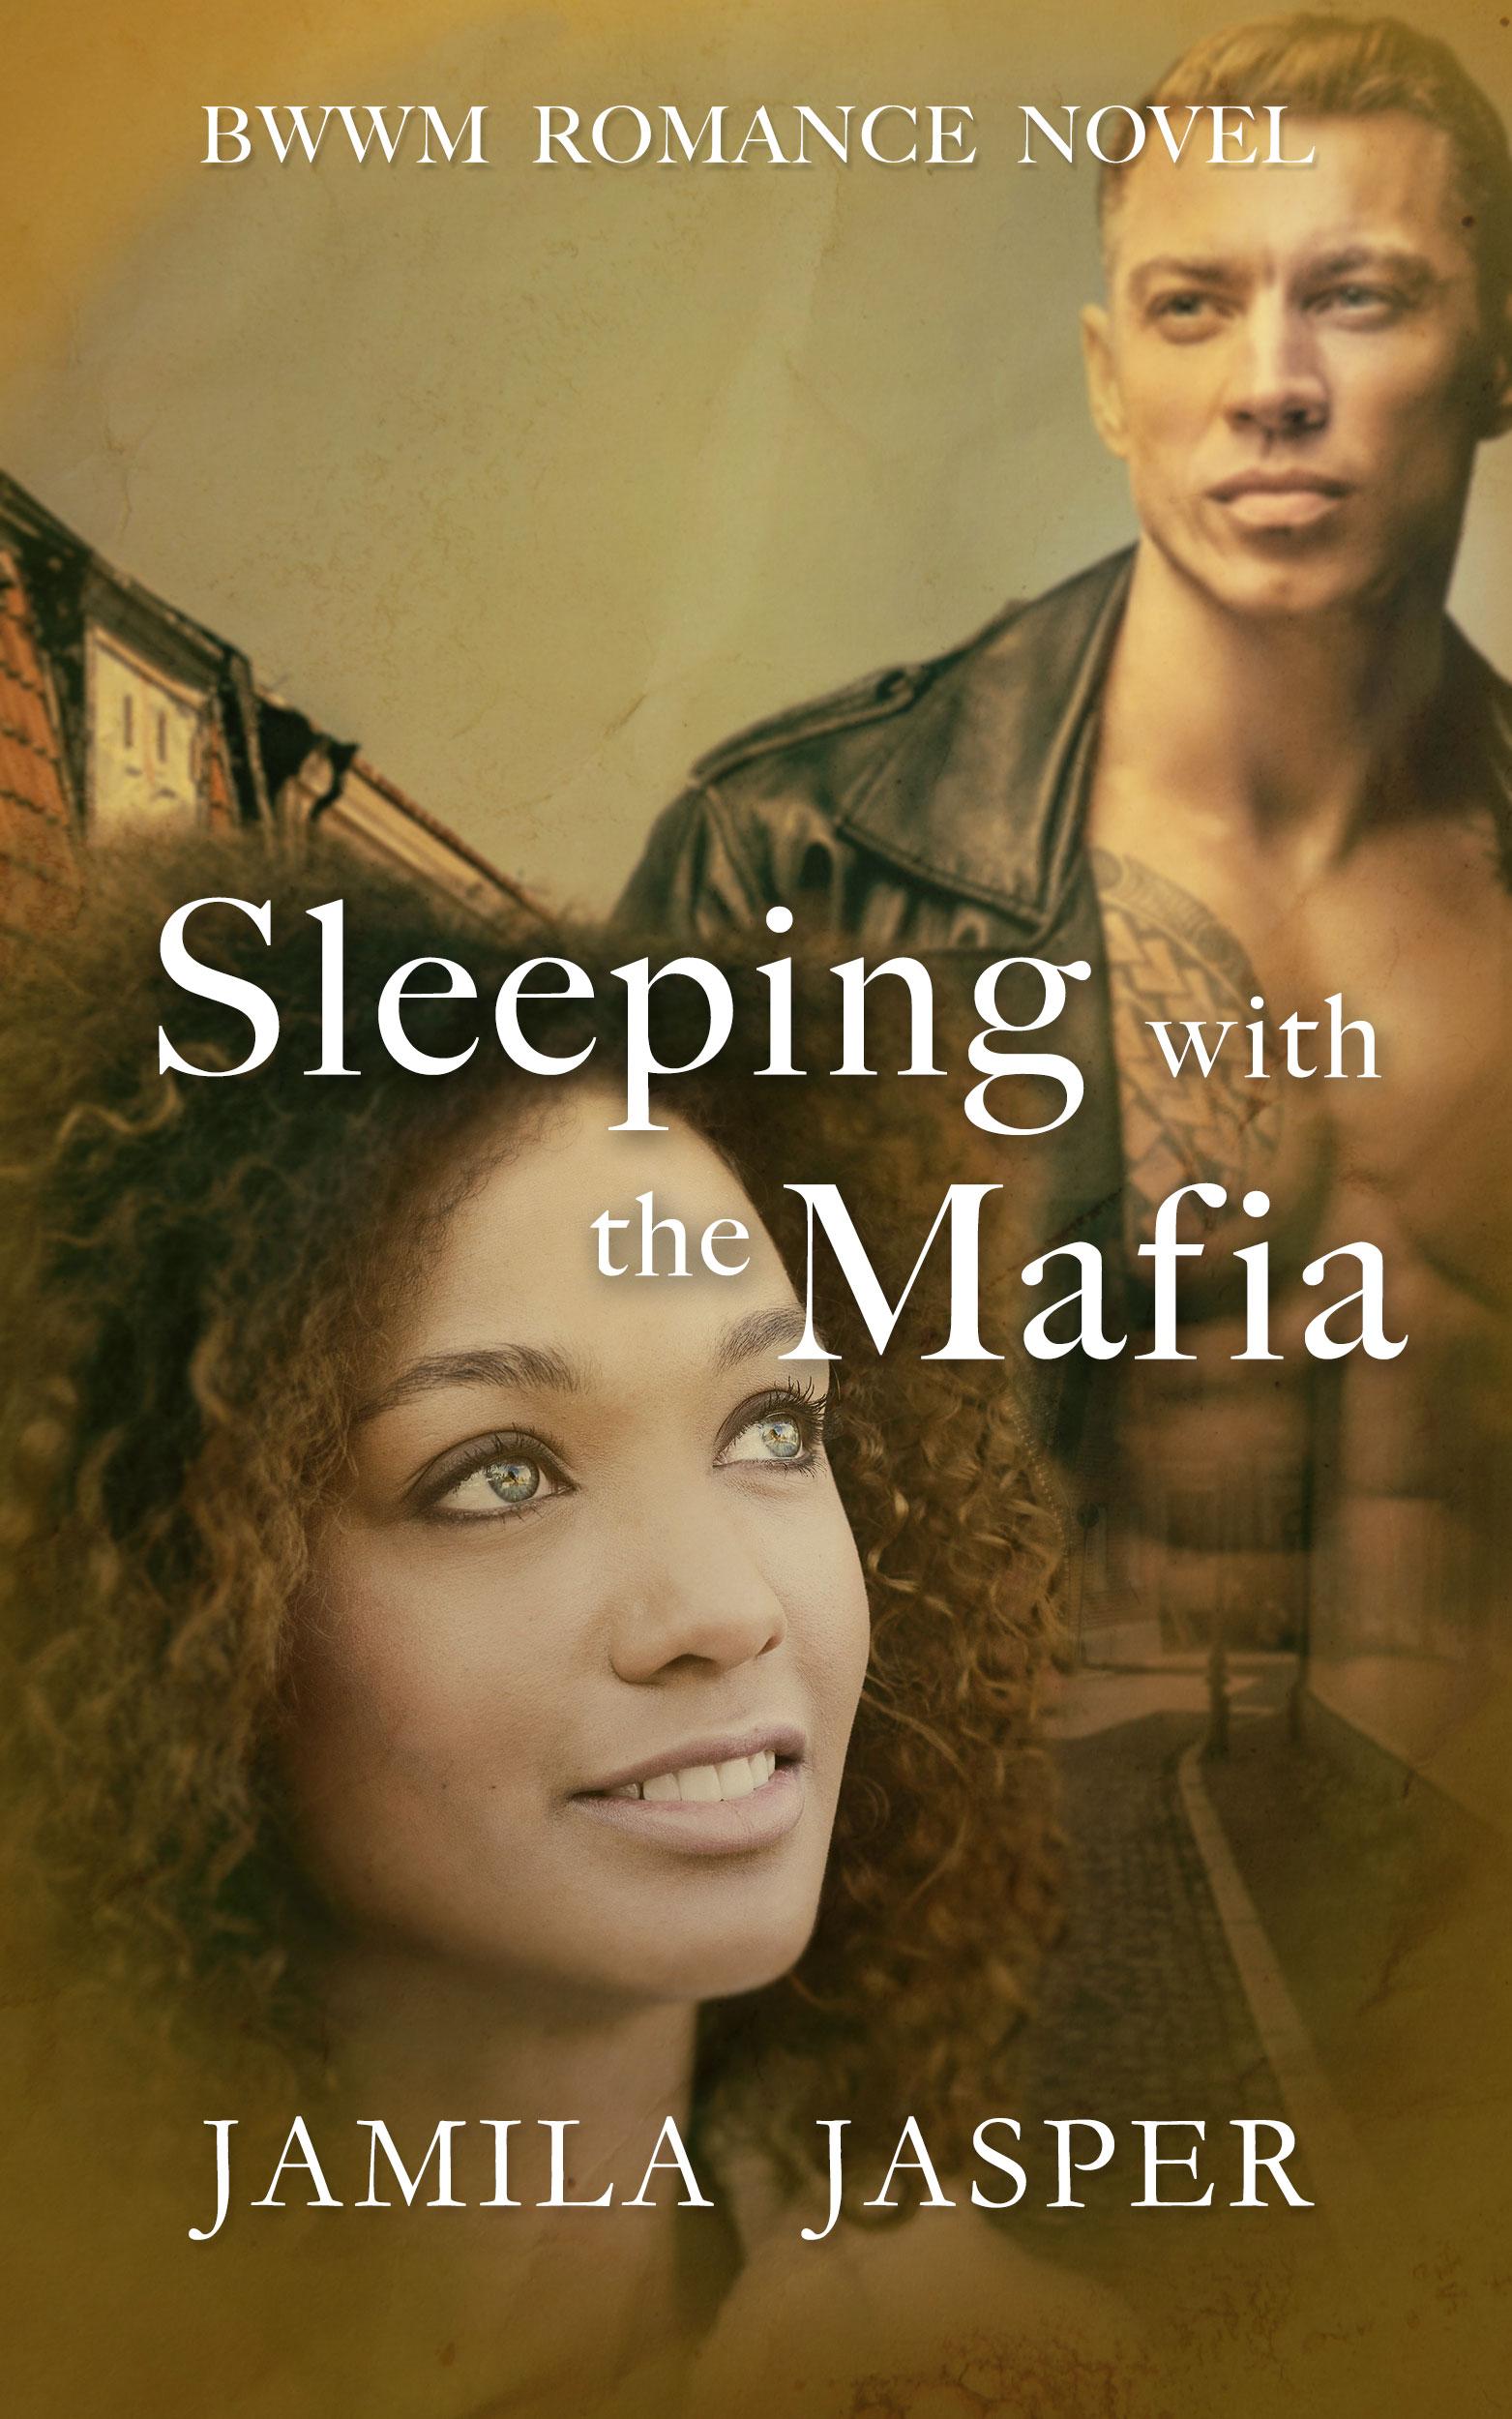 mafia swirl romance